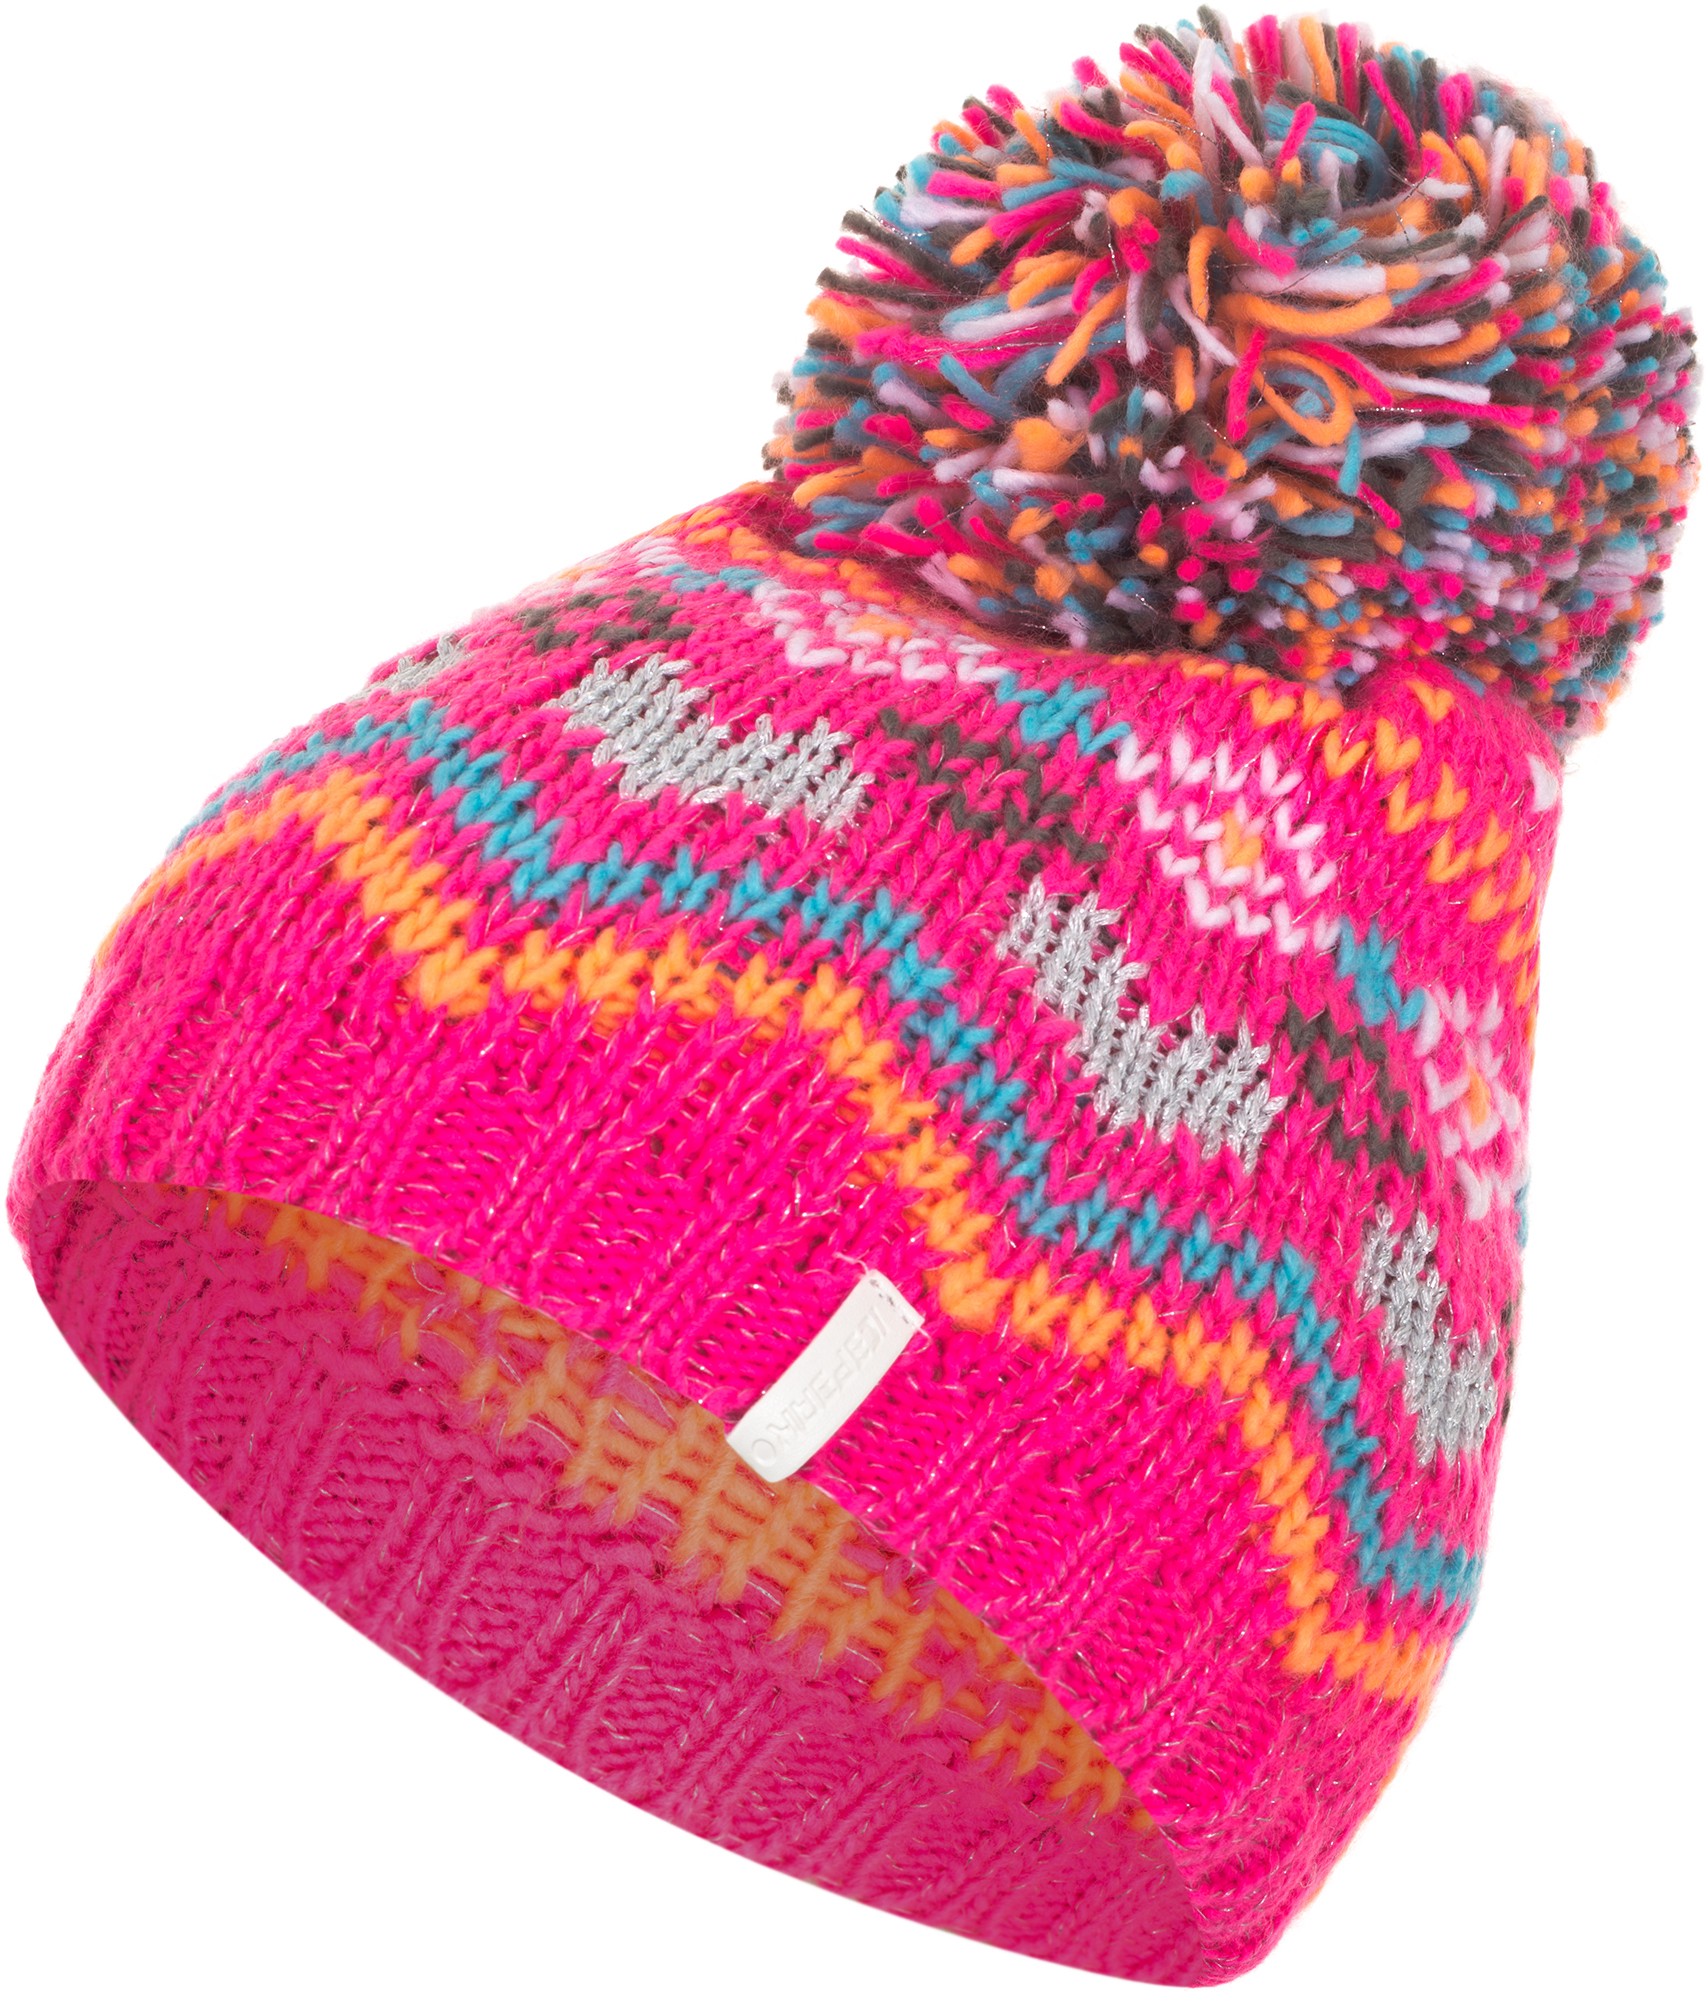 IcePeak Шапка для девочек IcePeak Ilsa, размер Без размера icepeak шапка мужская icepeak iolo размер без размера